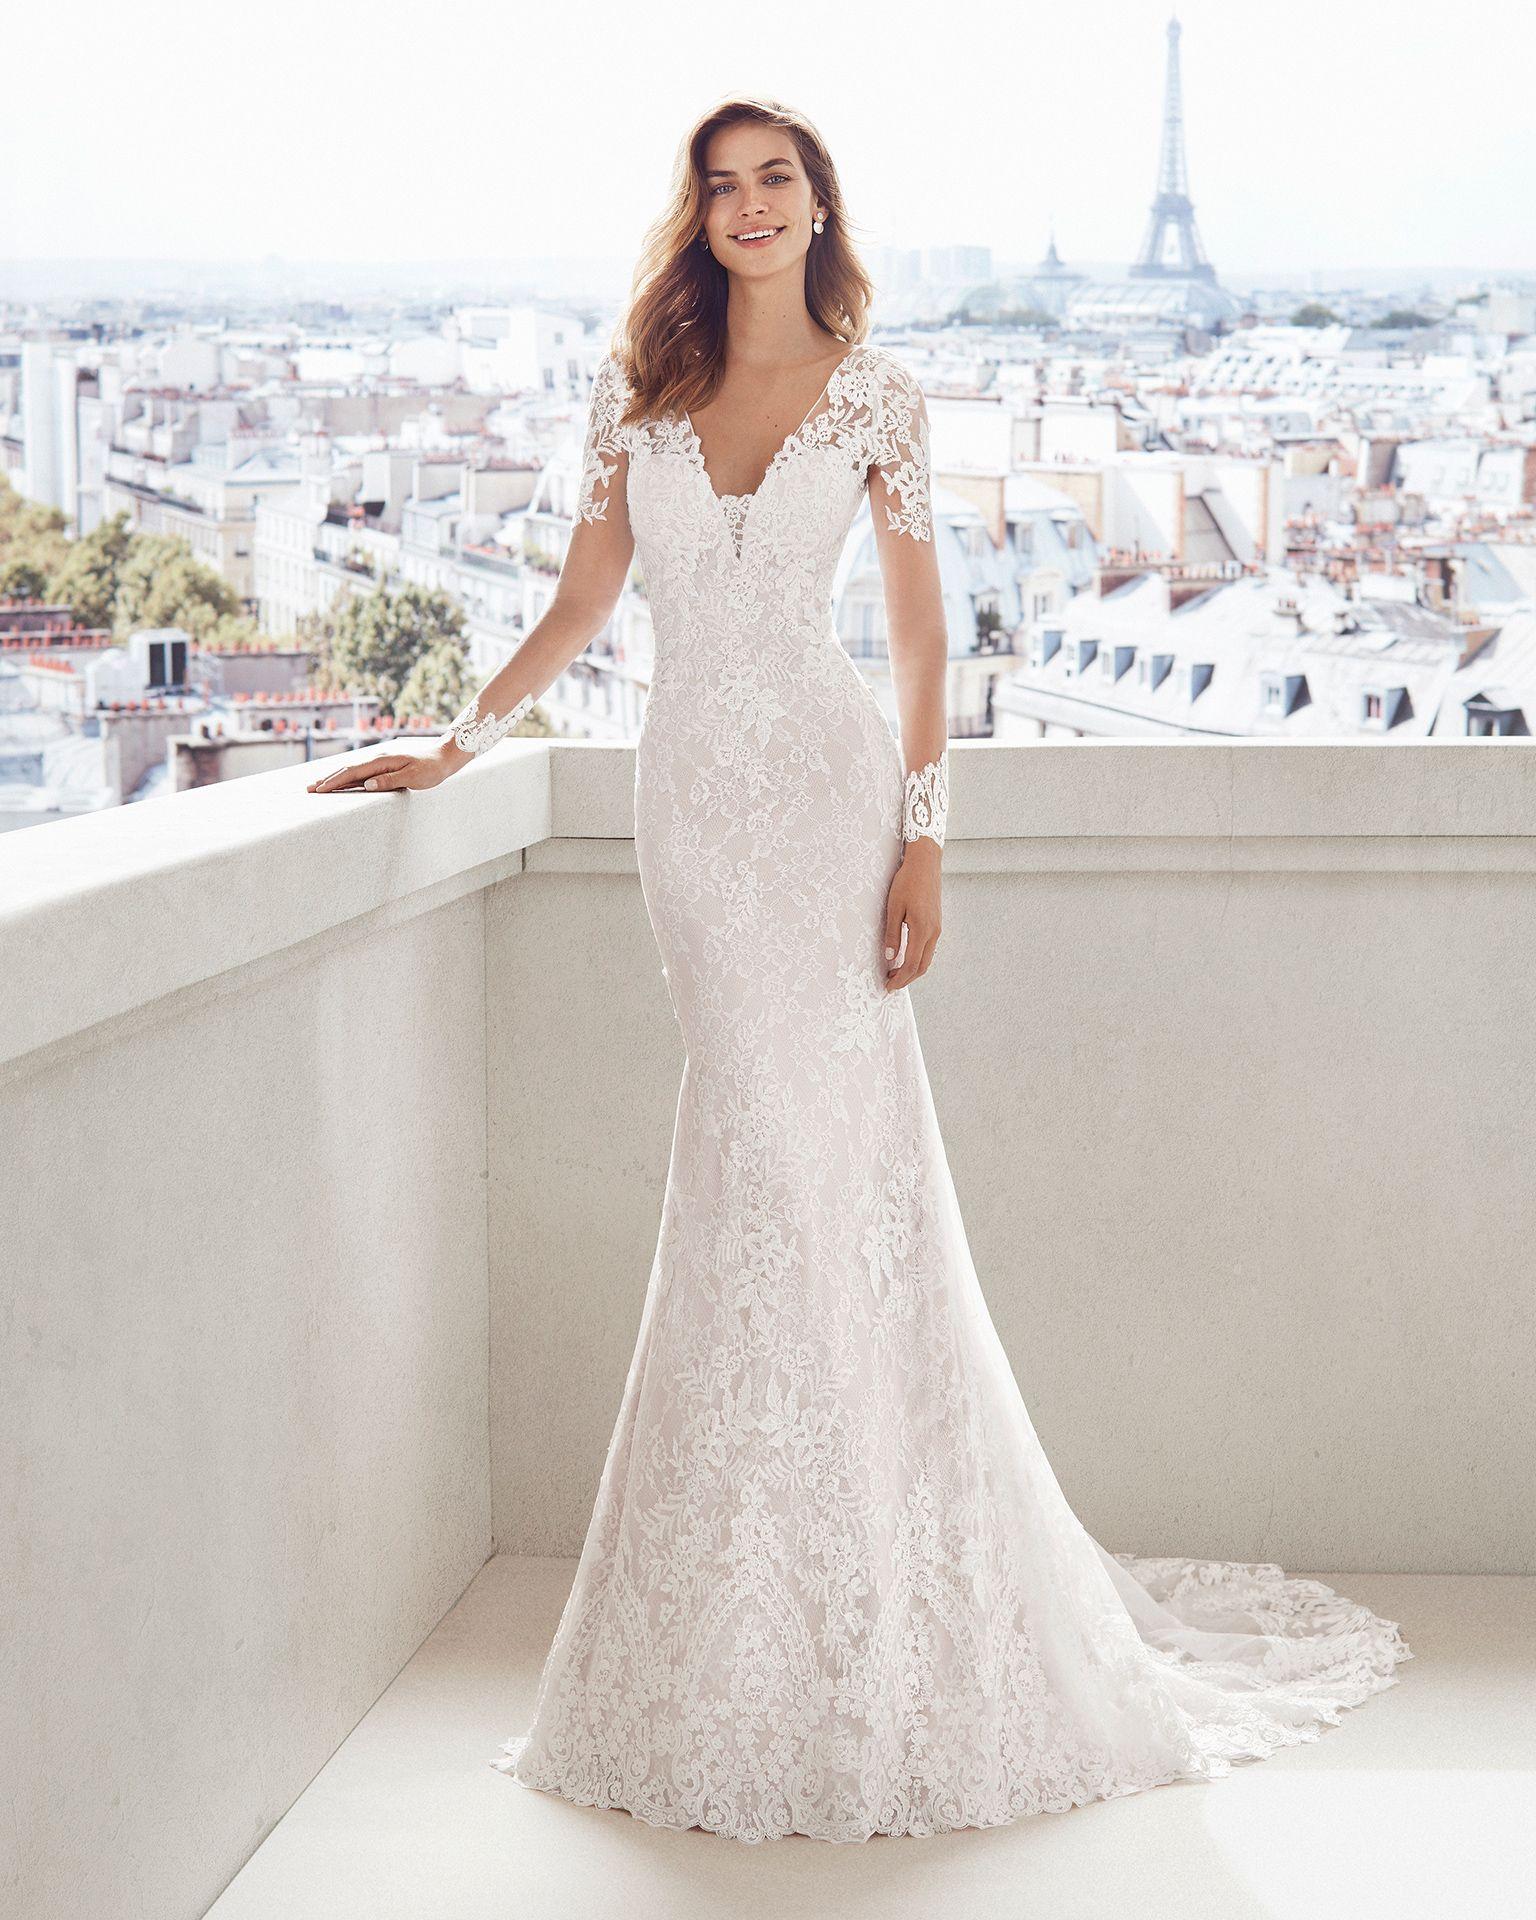 d855379265 Vestido de novia corte sirena de encaje. Escote V